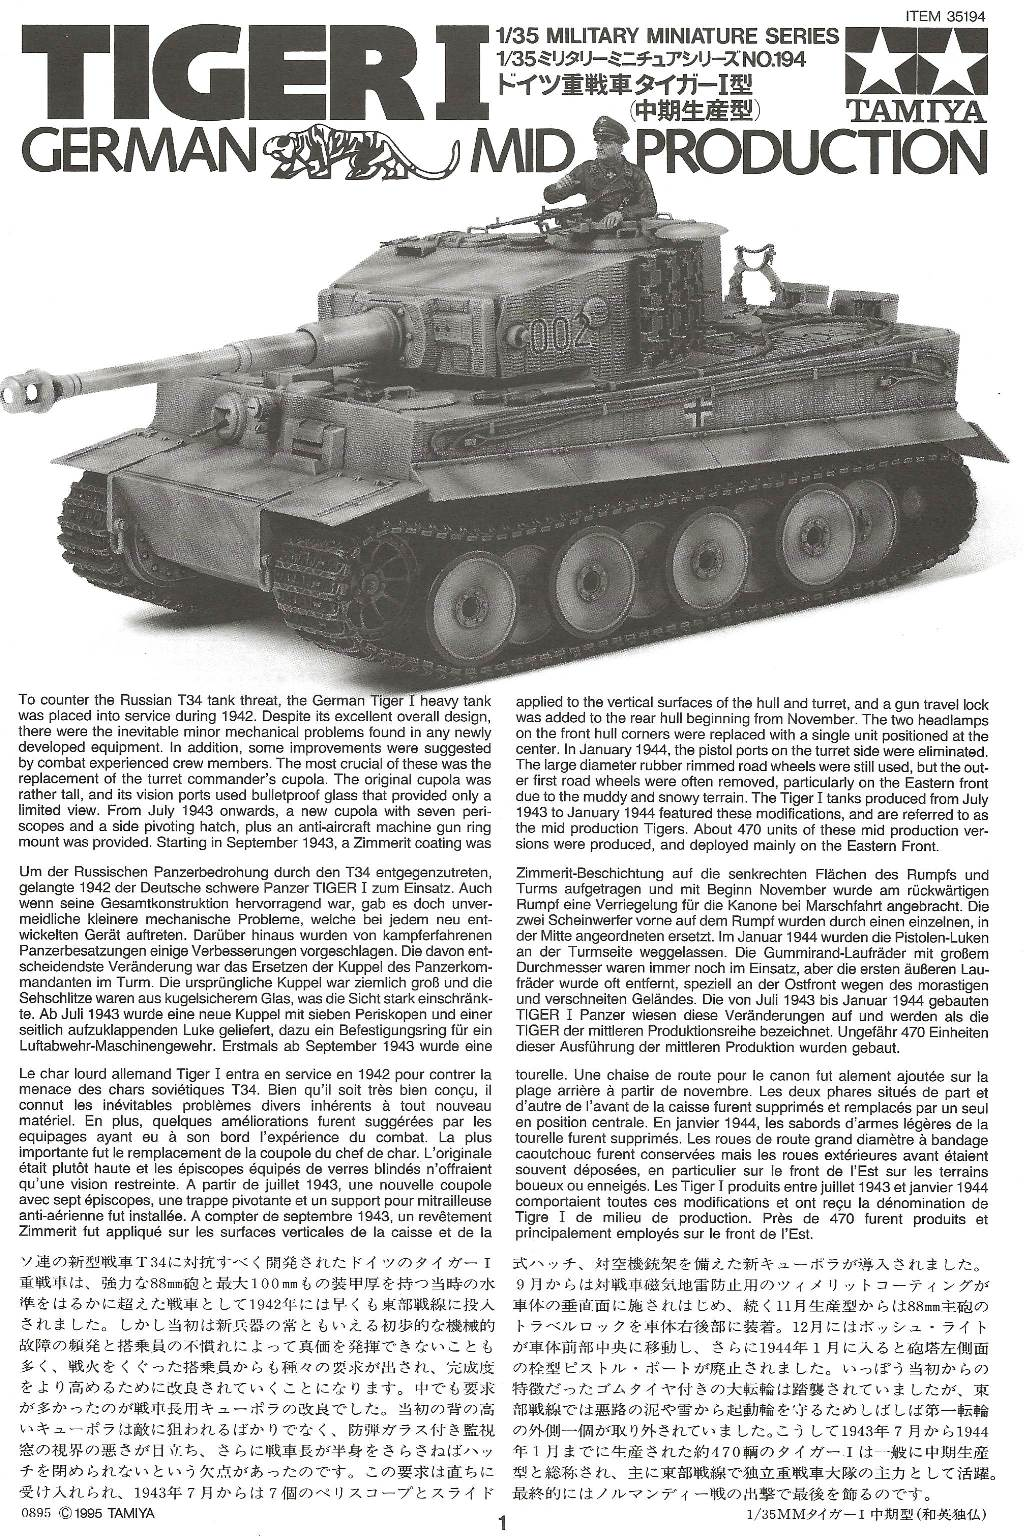 [Tamiya 1/35]  Tiger I mid production réf. 35194 Tigremid-plan-1